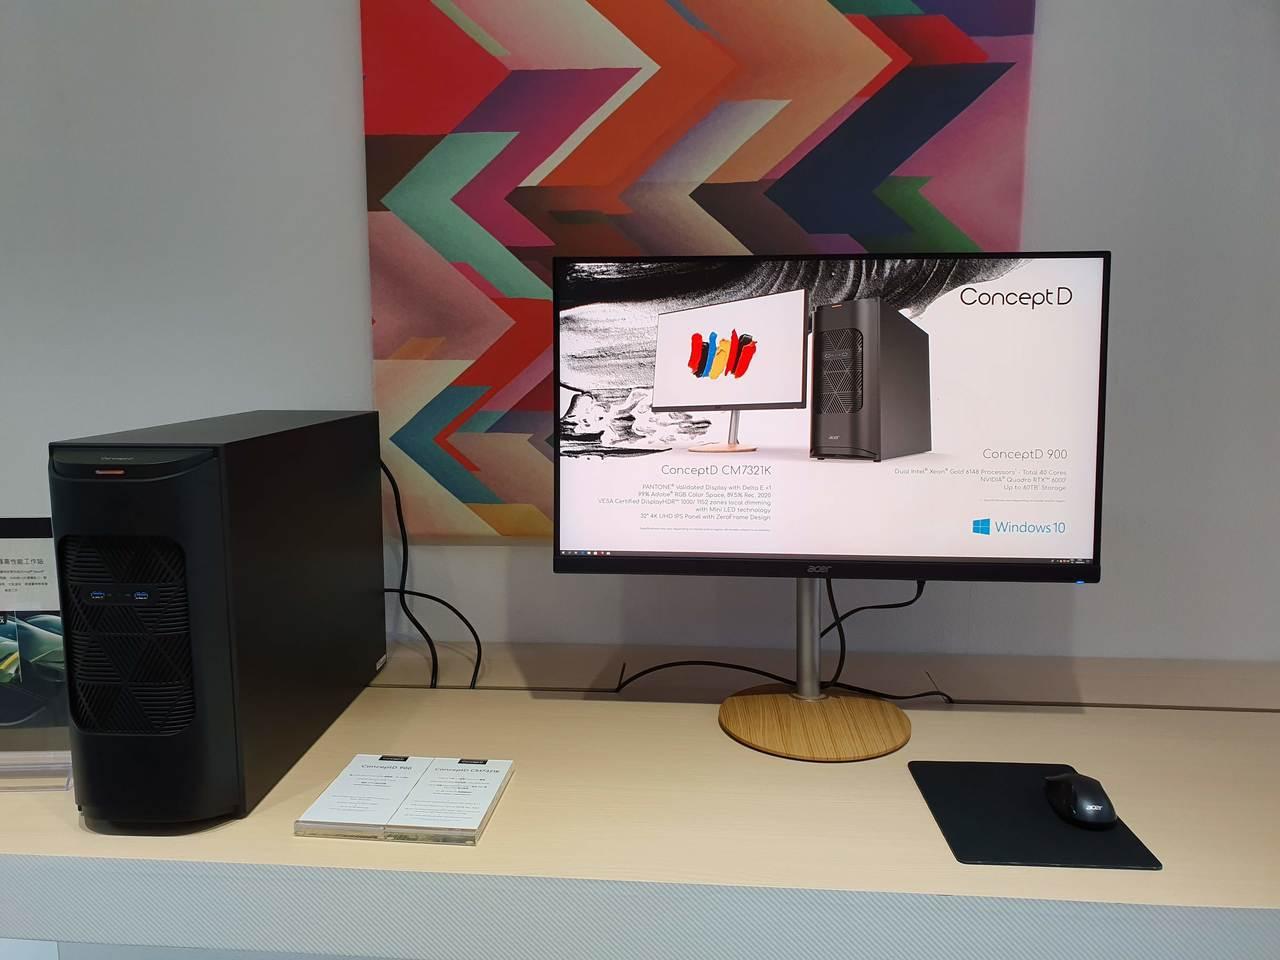 ConceptD 900專業工作站非常適合用於大型工作室的大規模專案。記者黃筱晴...